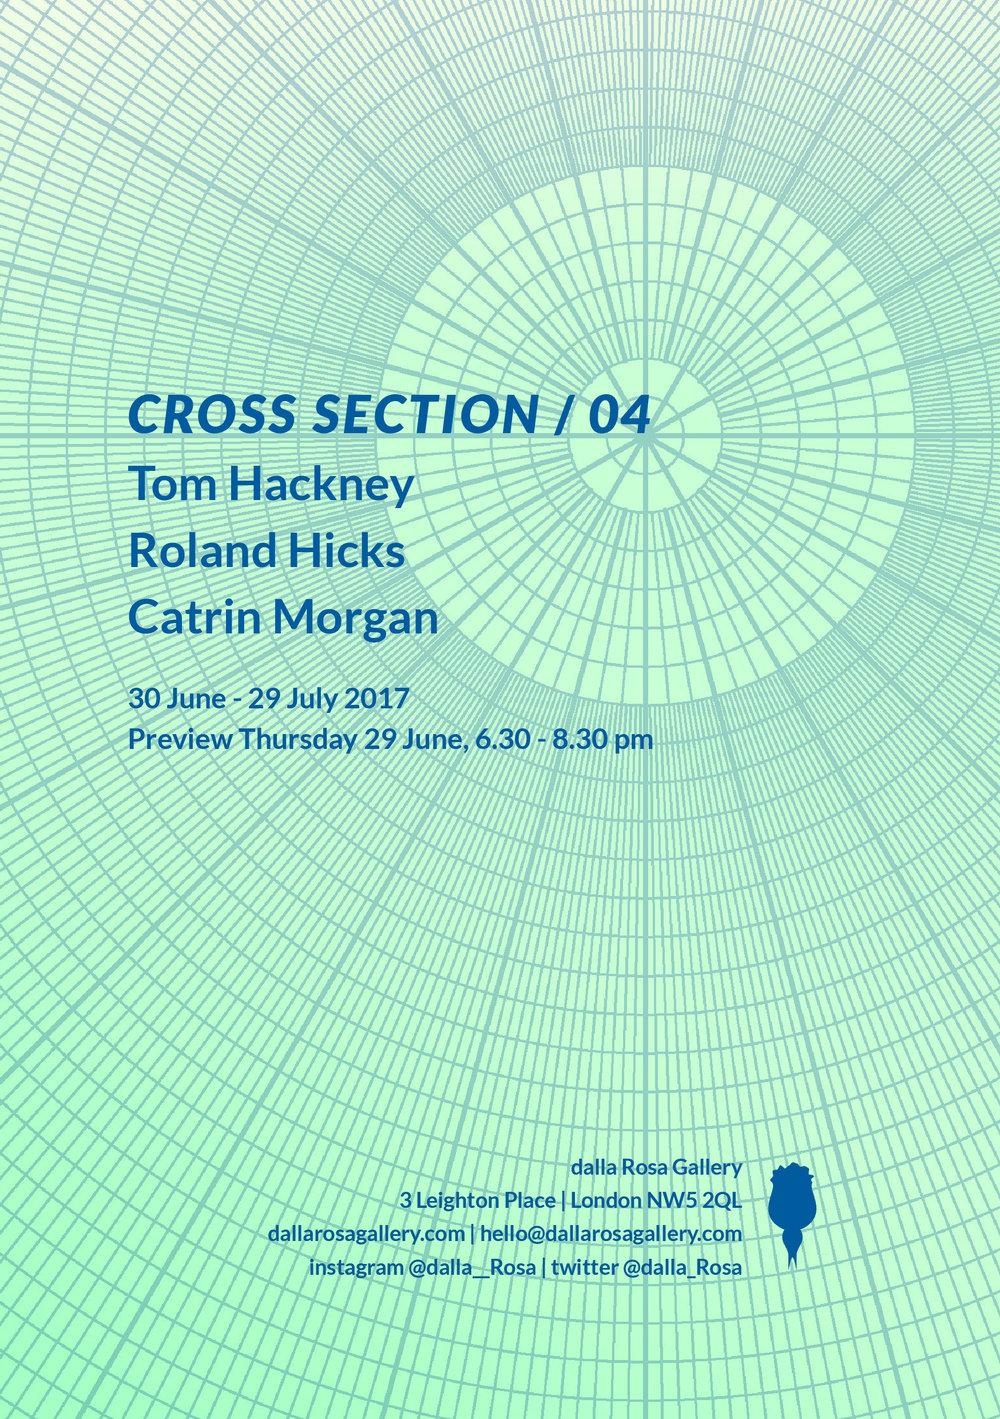 dalla_Rosa_CROSS_SECTION_04_2017_invite_final_high-res.jpg